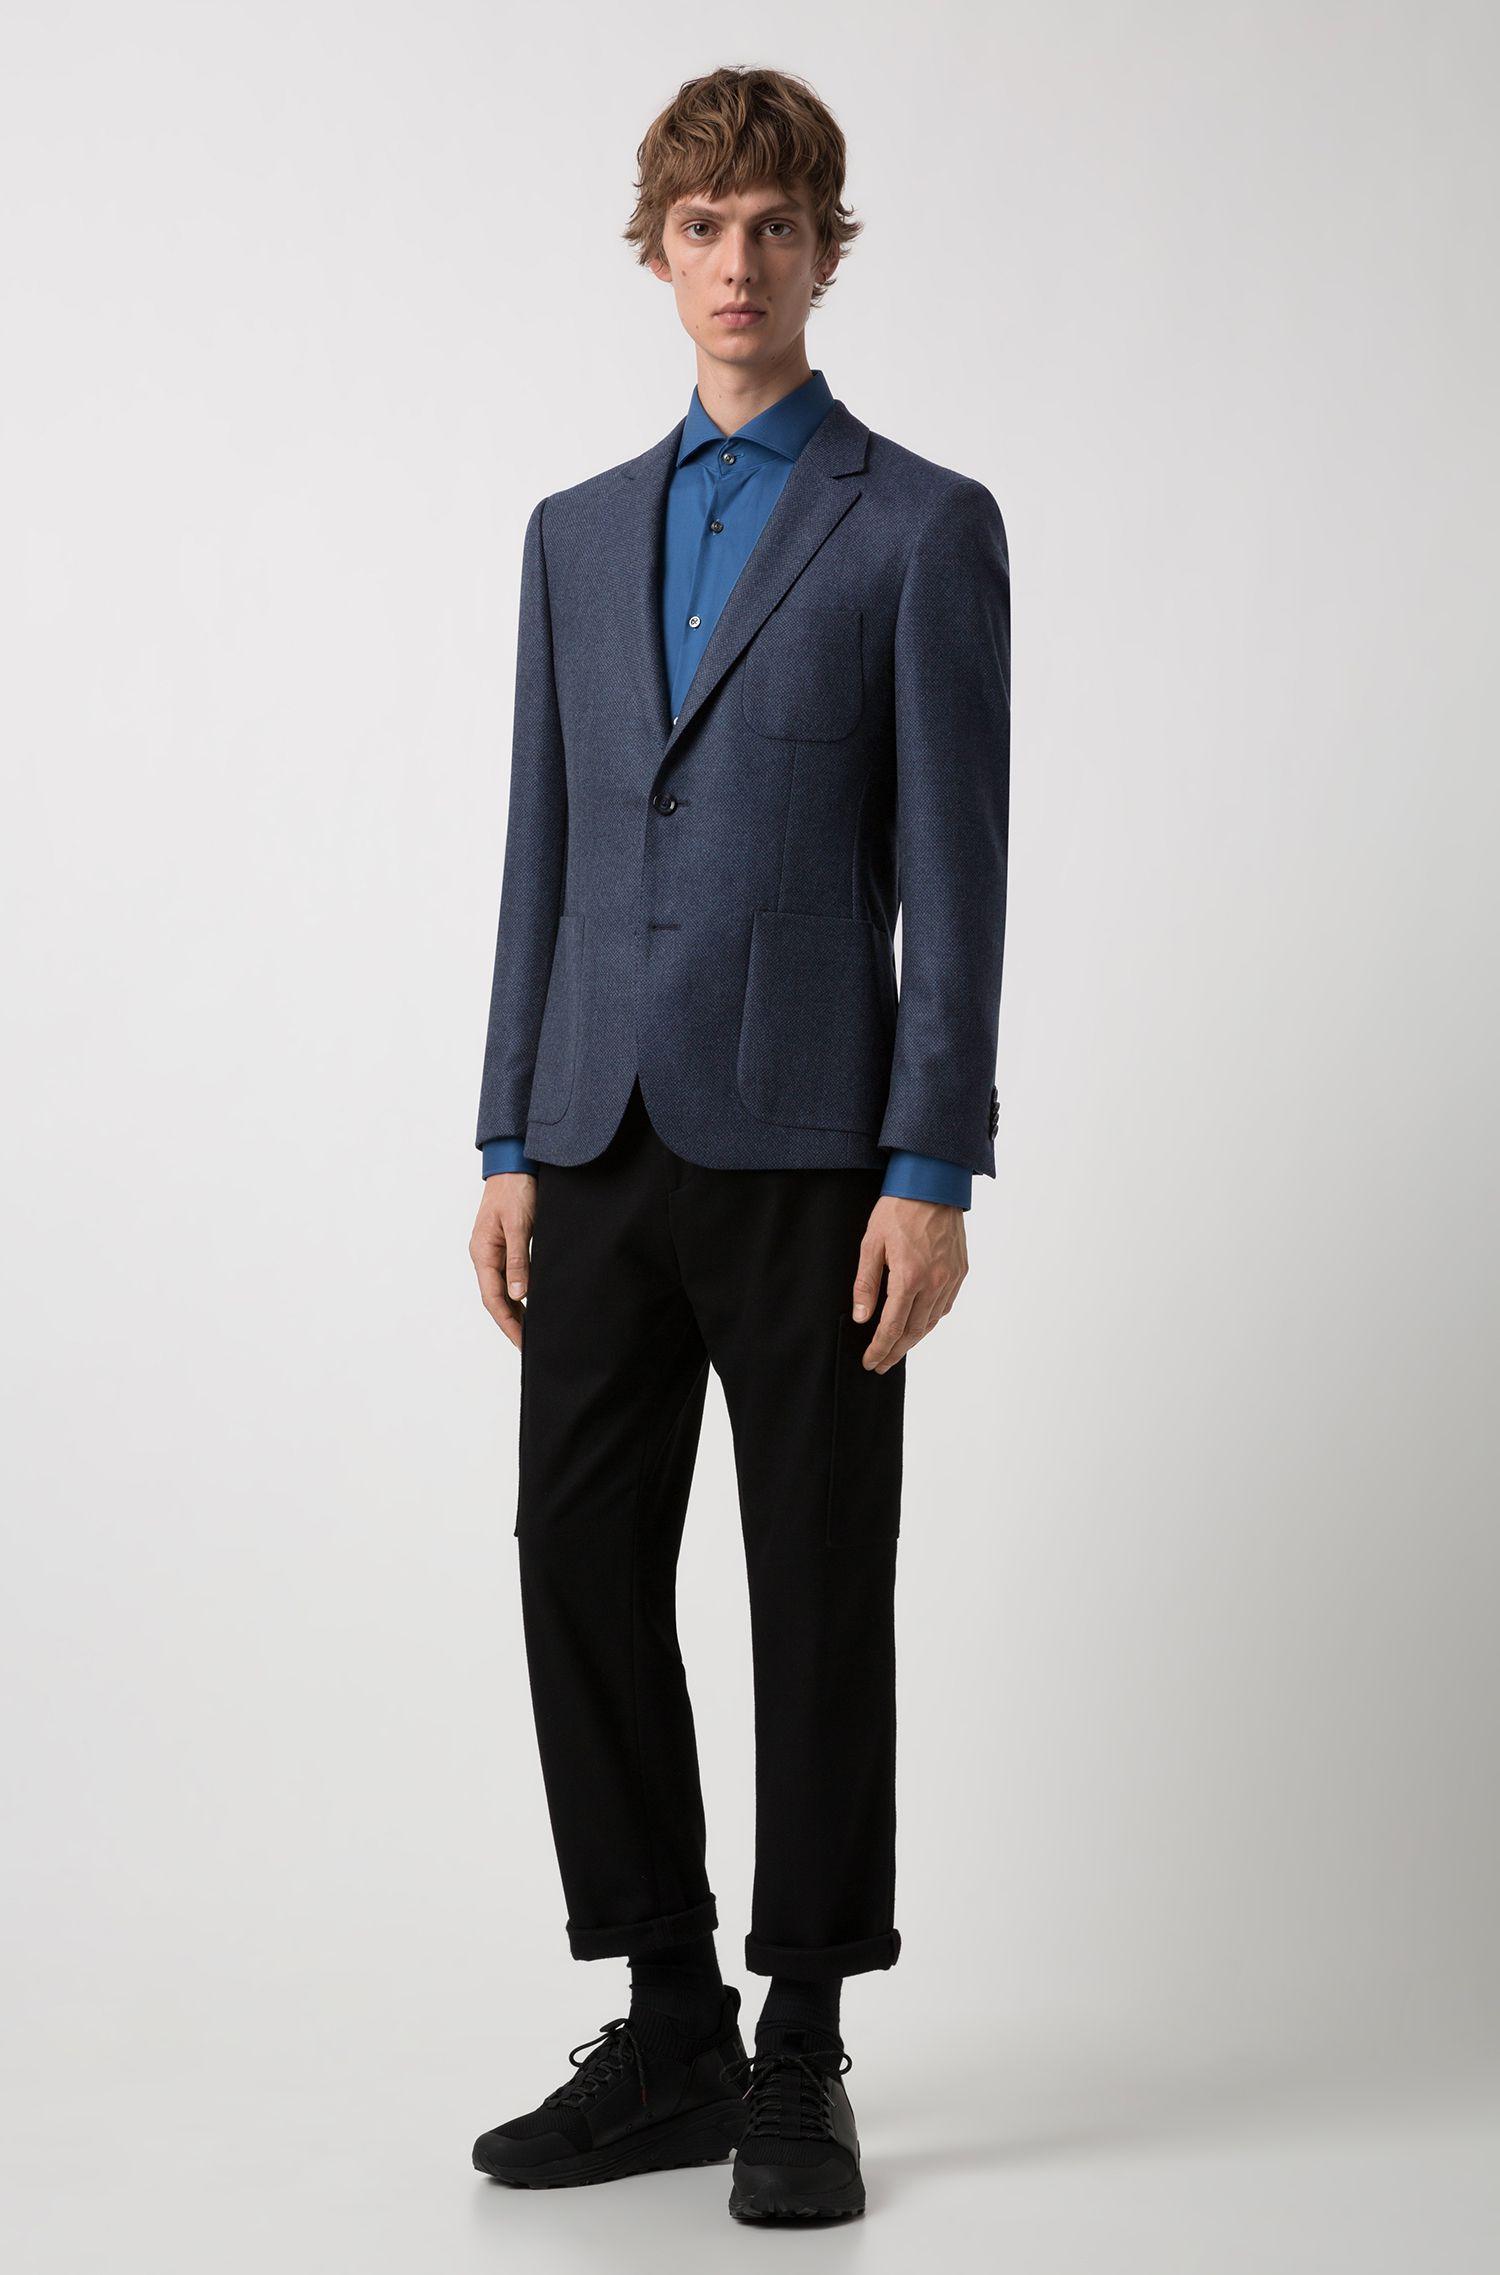 Chaqueta extra slim fit en lana virgen con microestructura, Azul oscuro